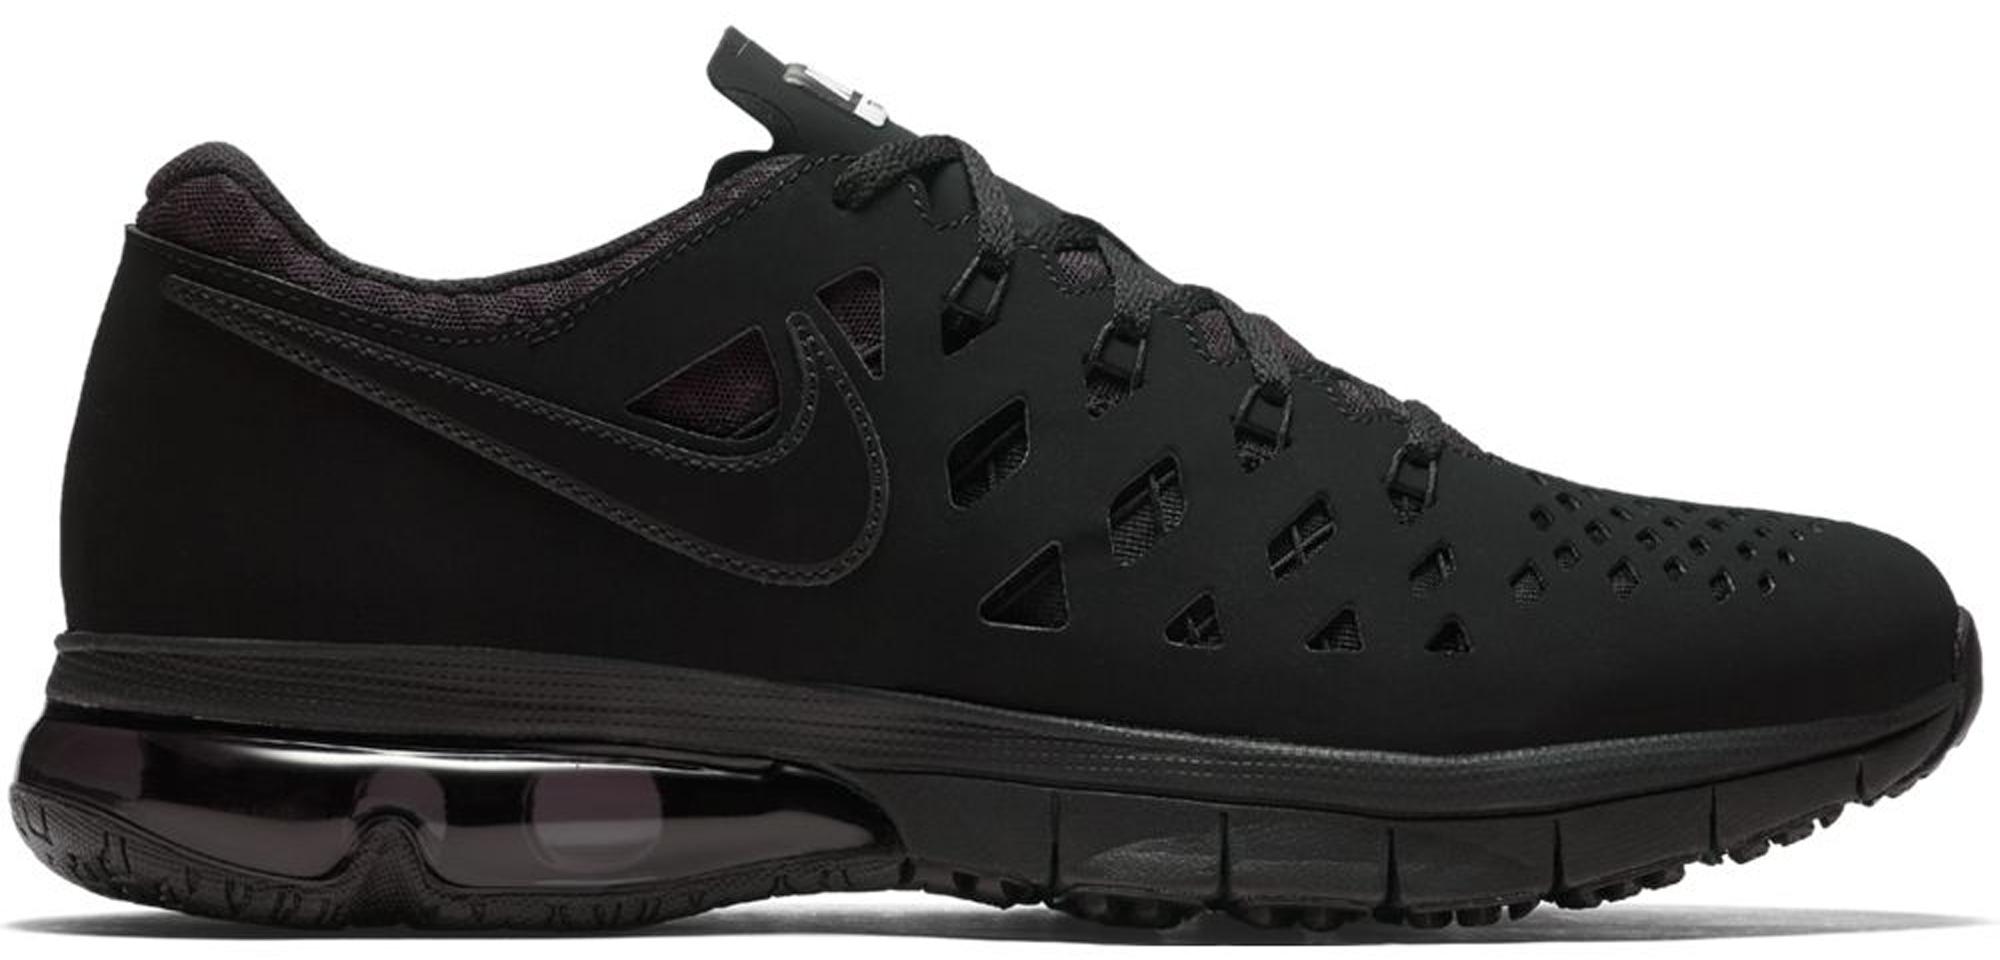 Nike Air Trainer 180 Black - 916460-003